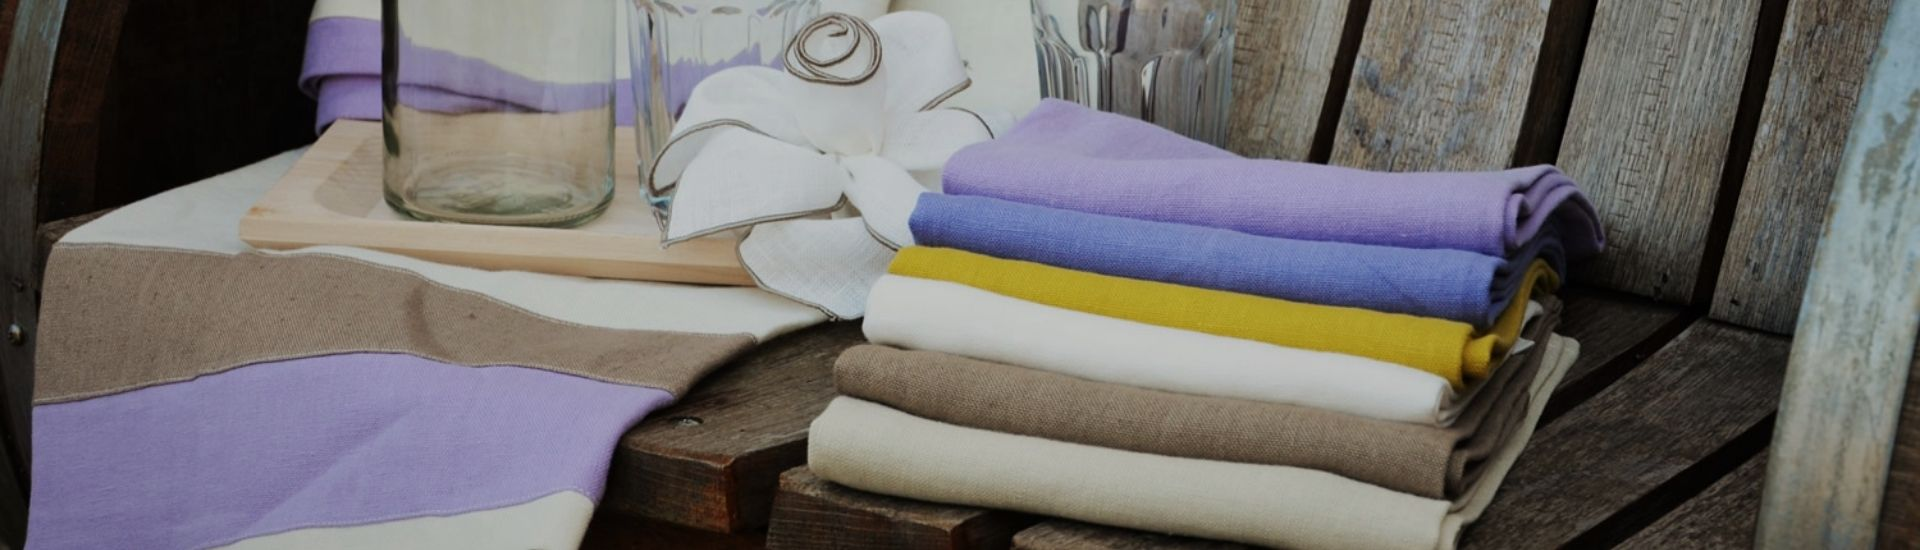 Tessuti punti vendita - Tessuto Artistico Umbro